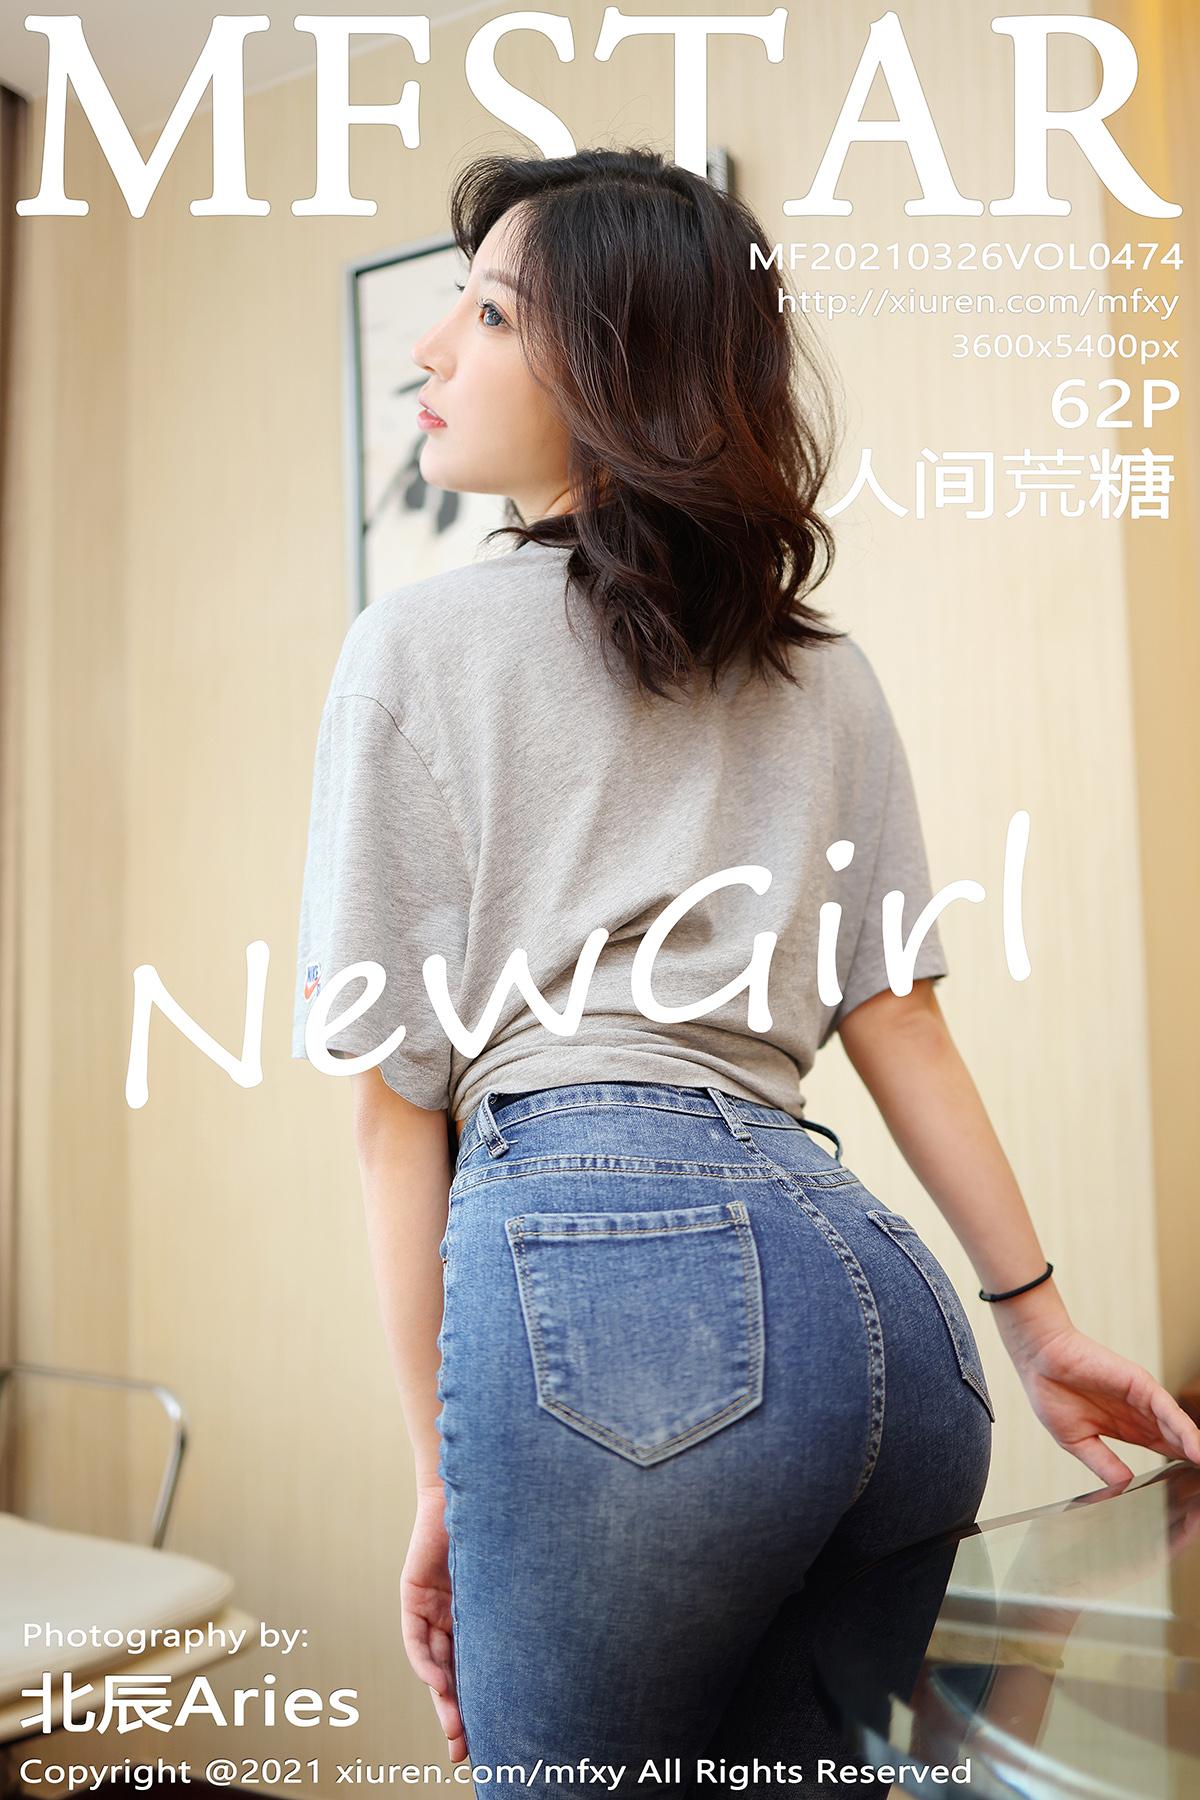 [MFStar模范學院] 2021.03.26 VOL.474 人間荒糖 性感牛仔褲主題系列 [62P] - 貼圖 - 清涼寫真 -